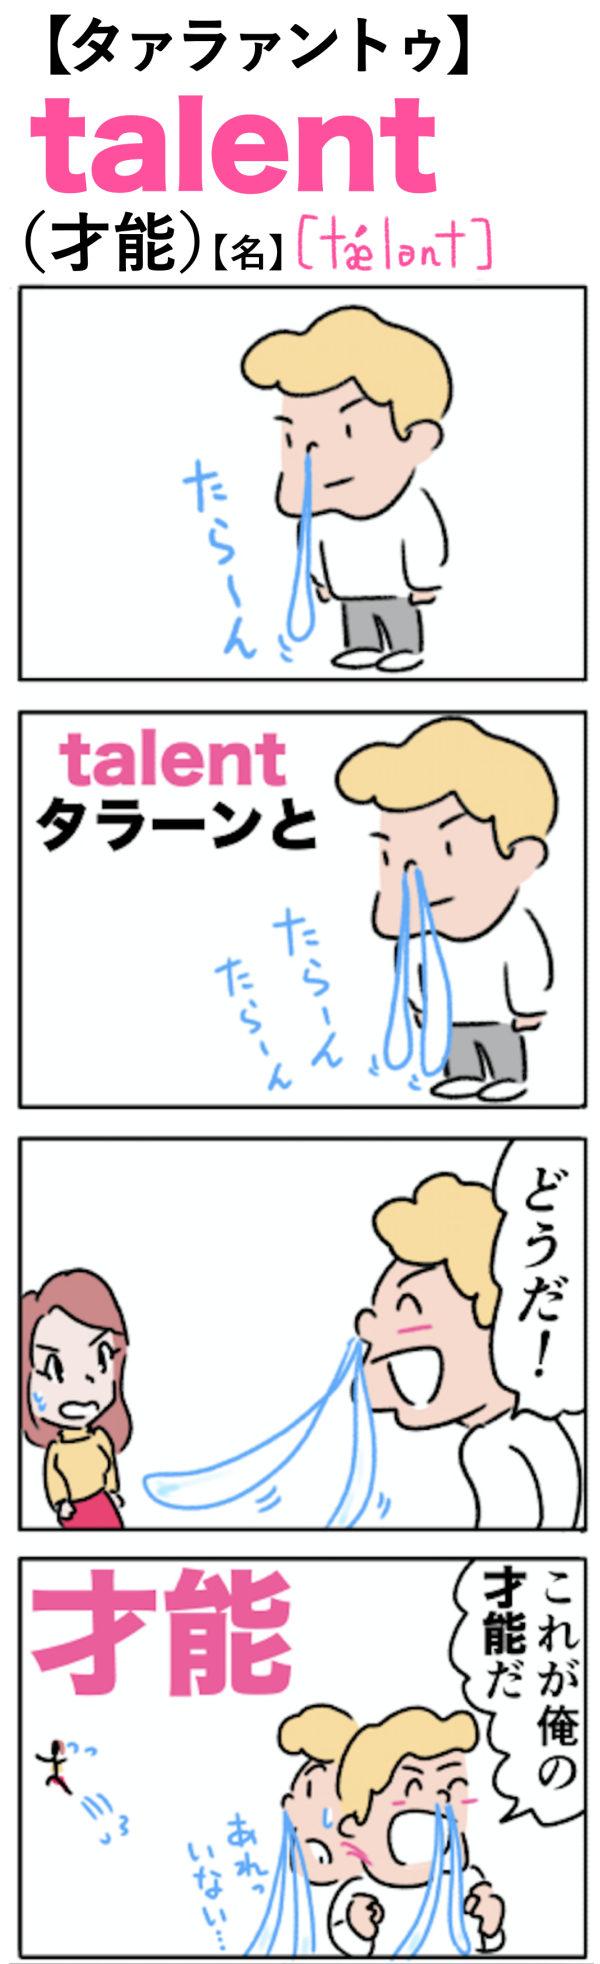 talent(才能)の語呂合わせ英単語